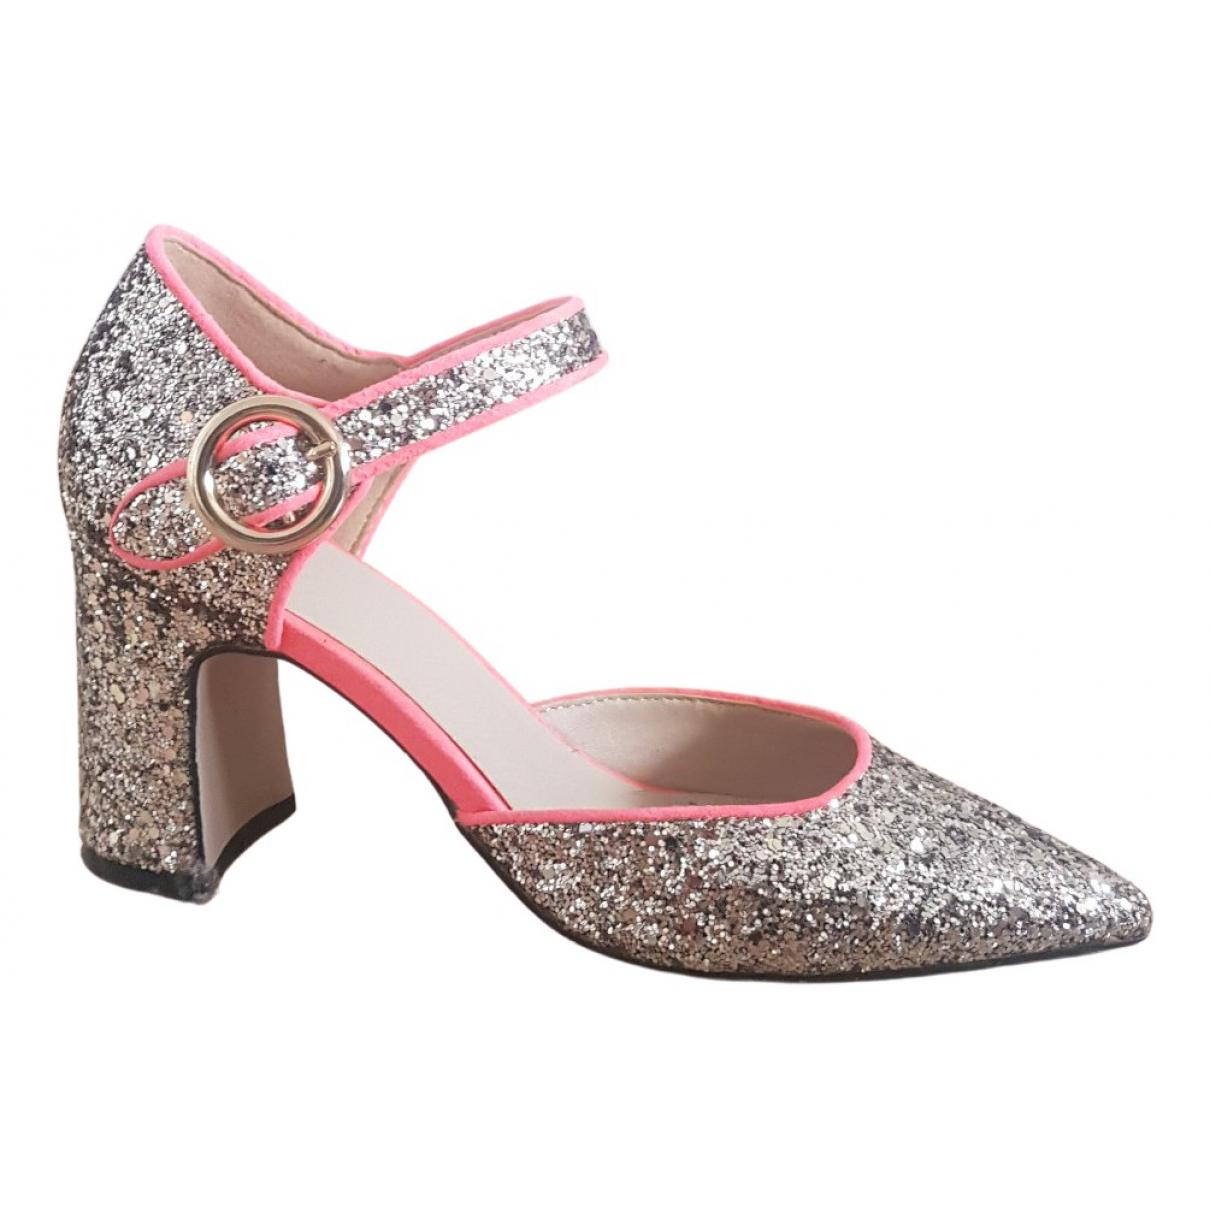 Asos N Silver Glitter Heels for Women 5 UK